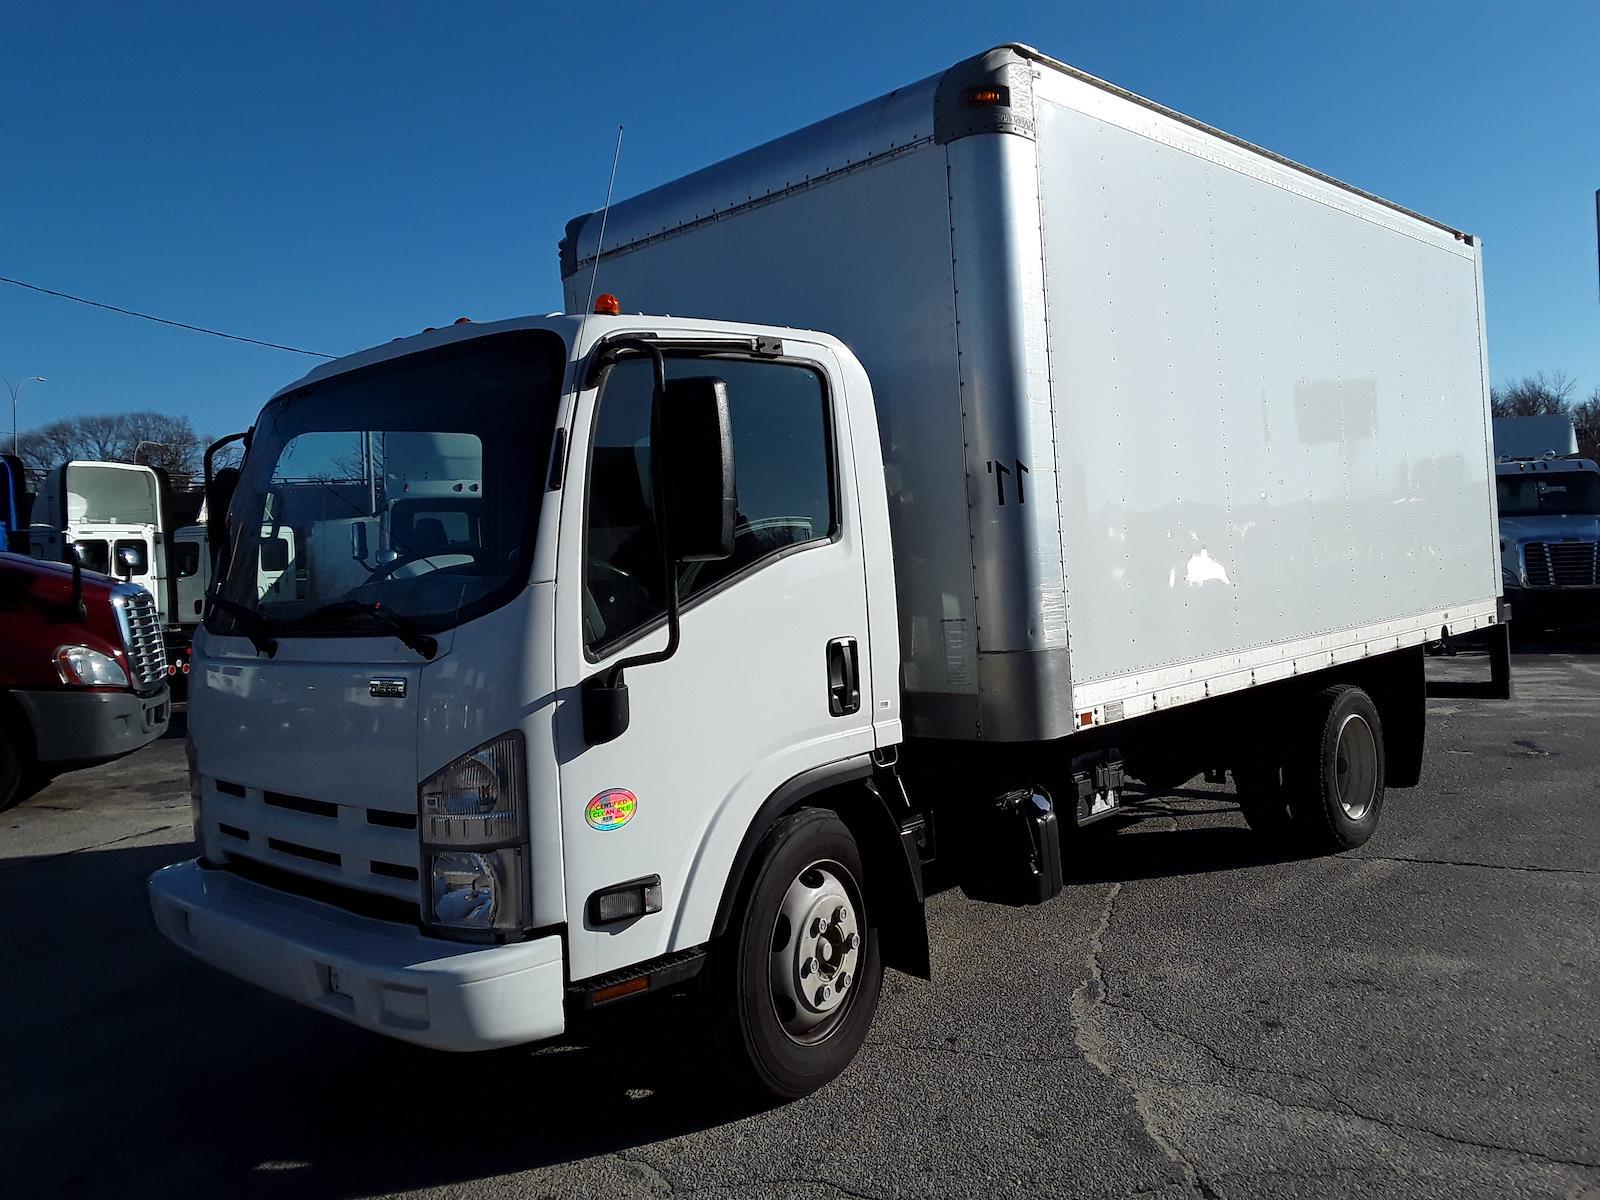 2015 Isuzu NQR Regular Cab 4x2, Dry Freight #338679 - photo 1